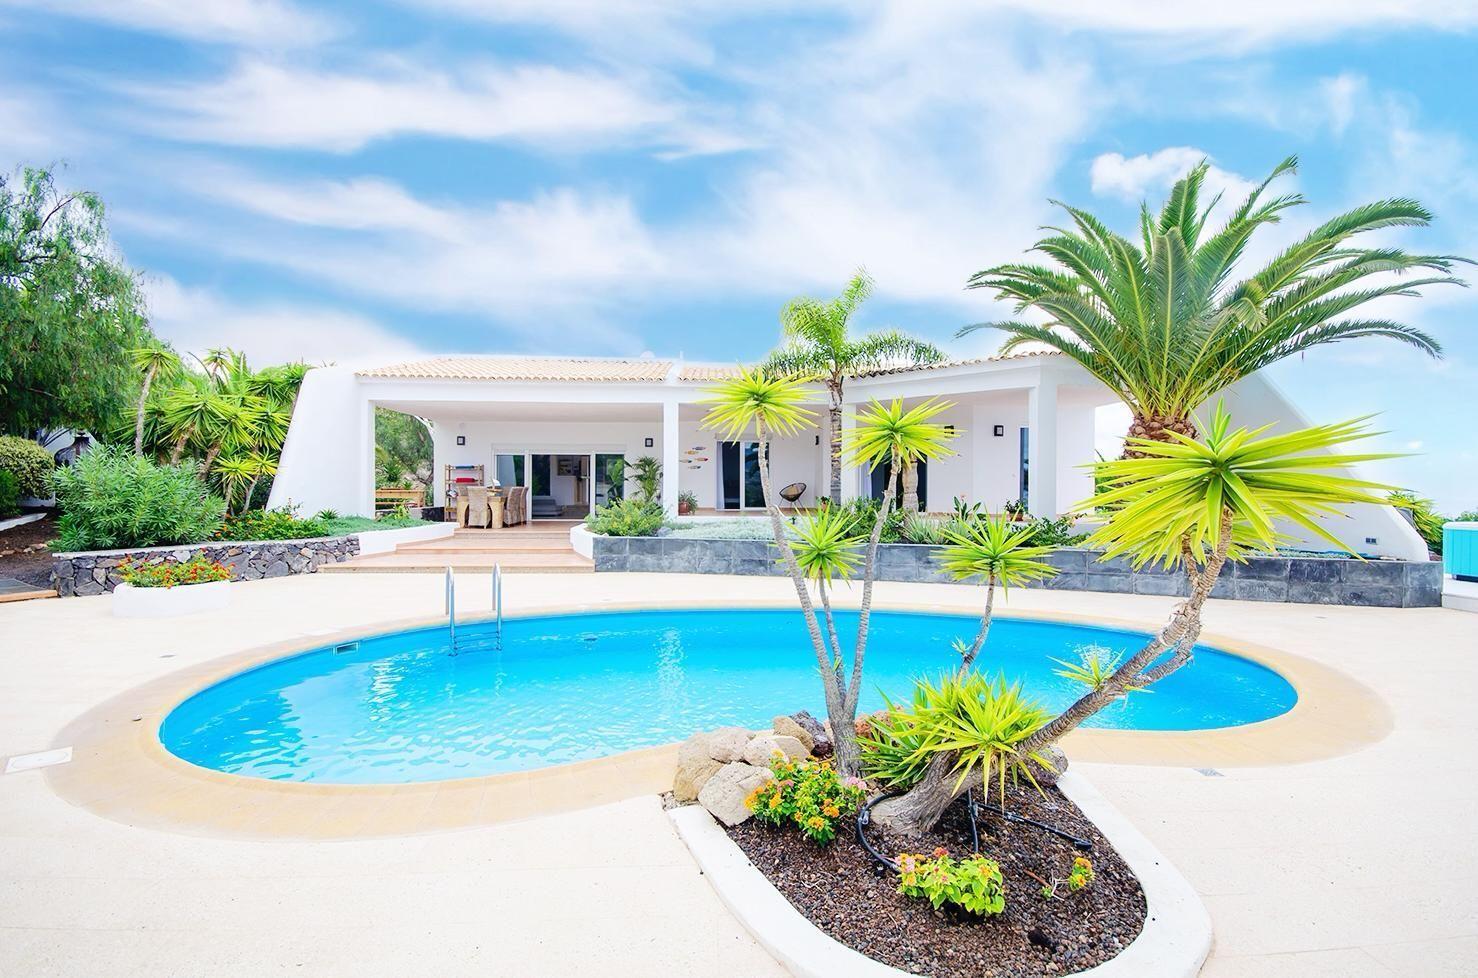 Luxury Villa in Tijoco de Abajo, for sale